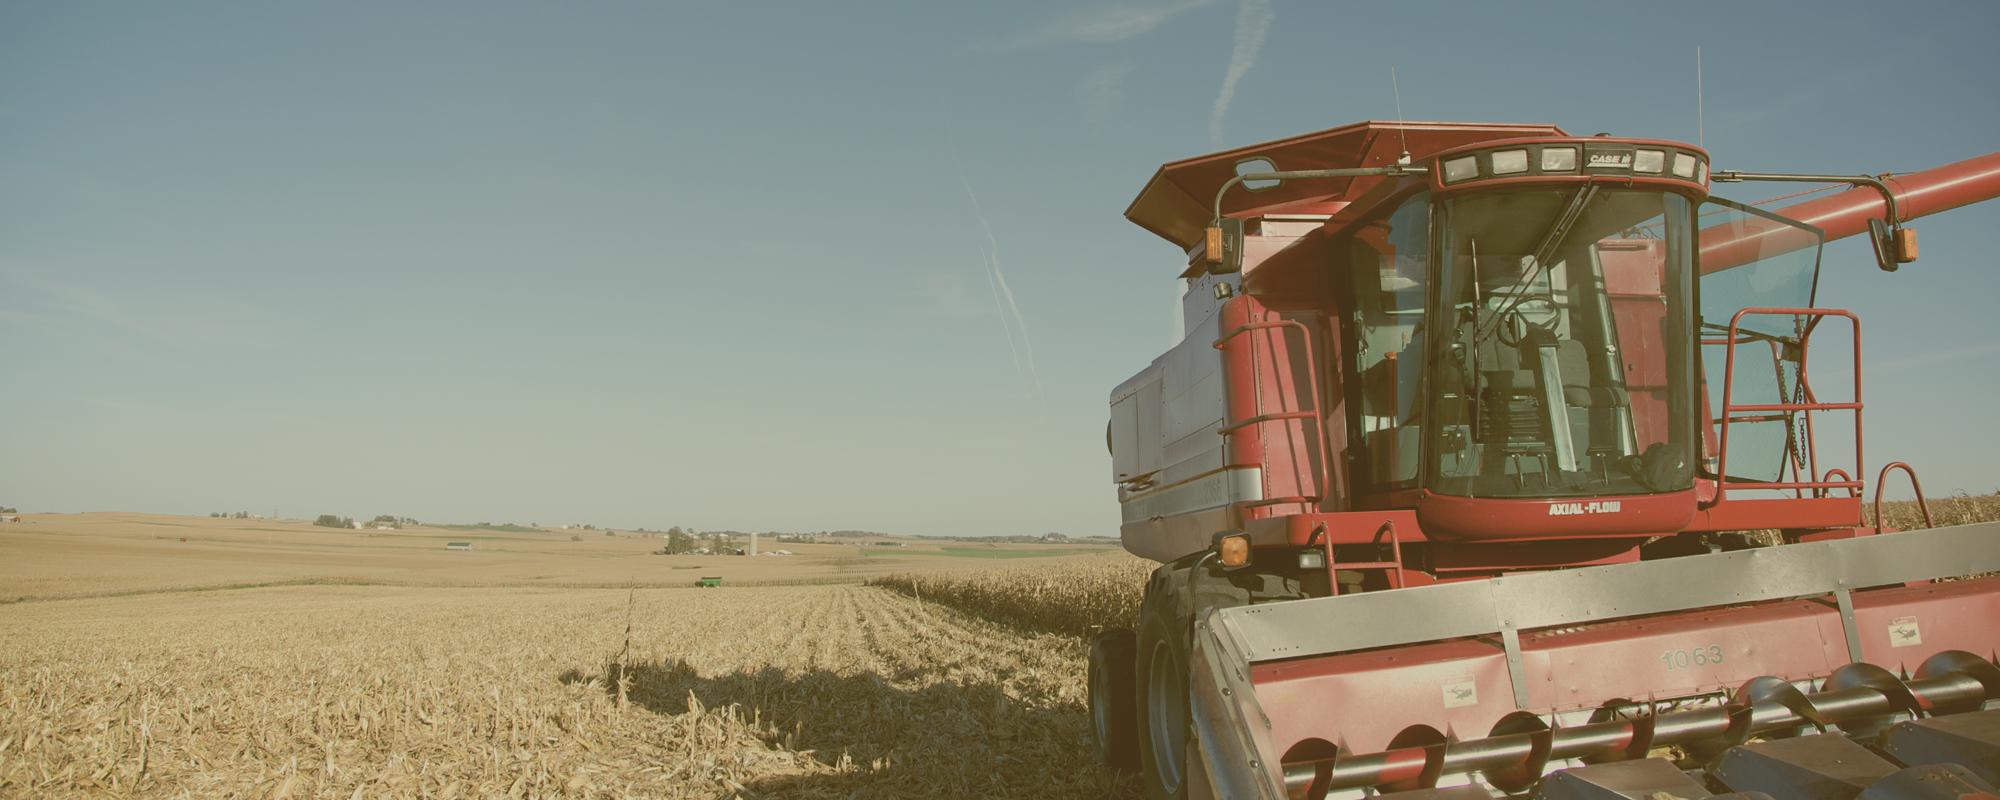 tractor-field-slider1